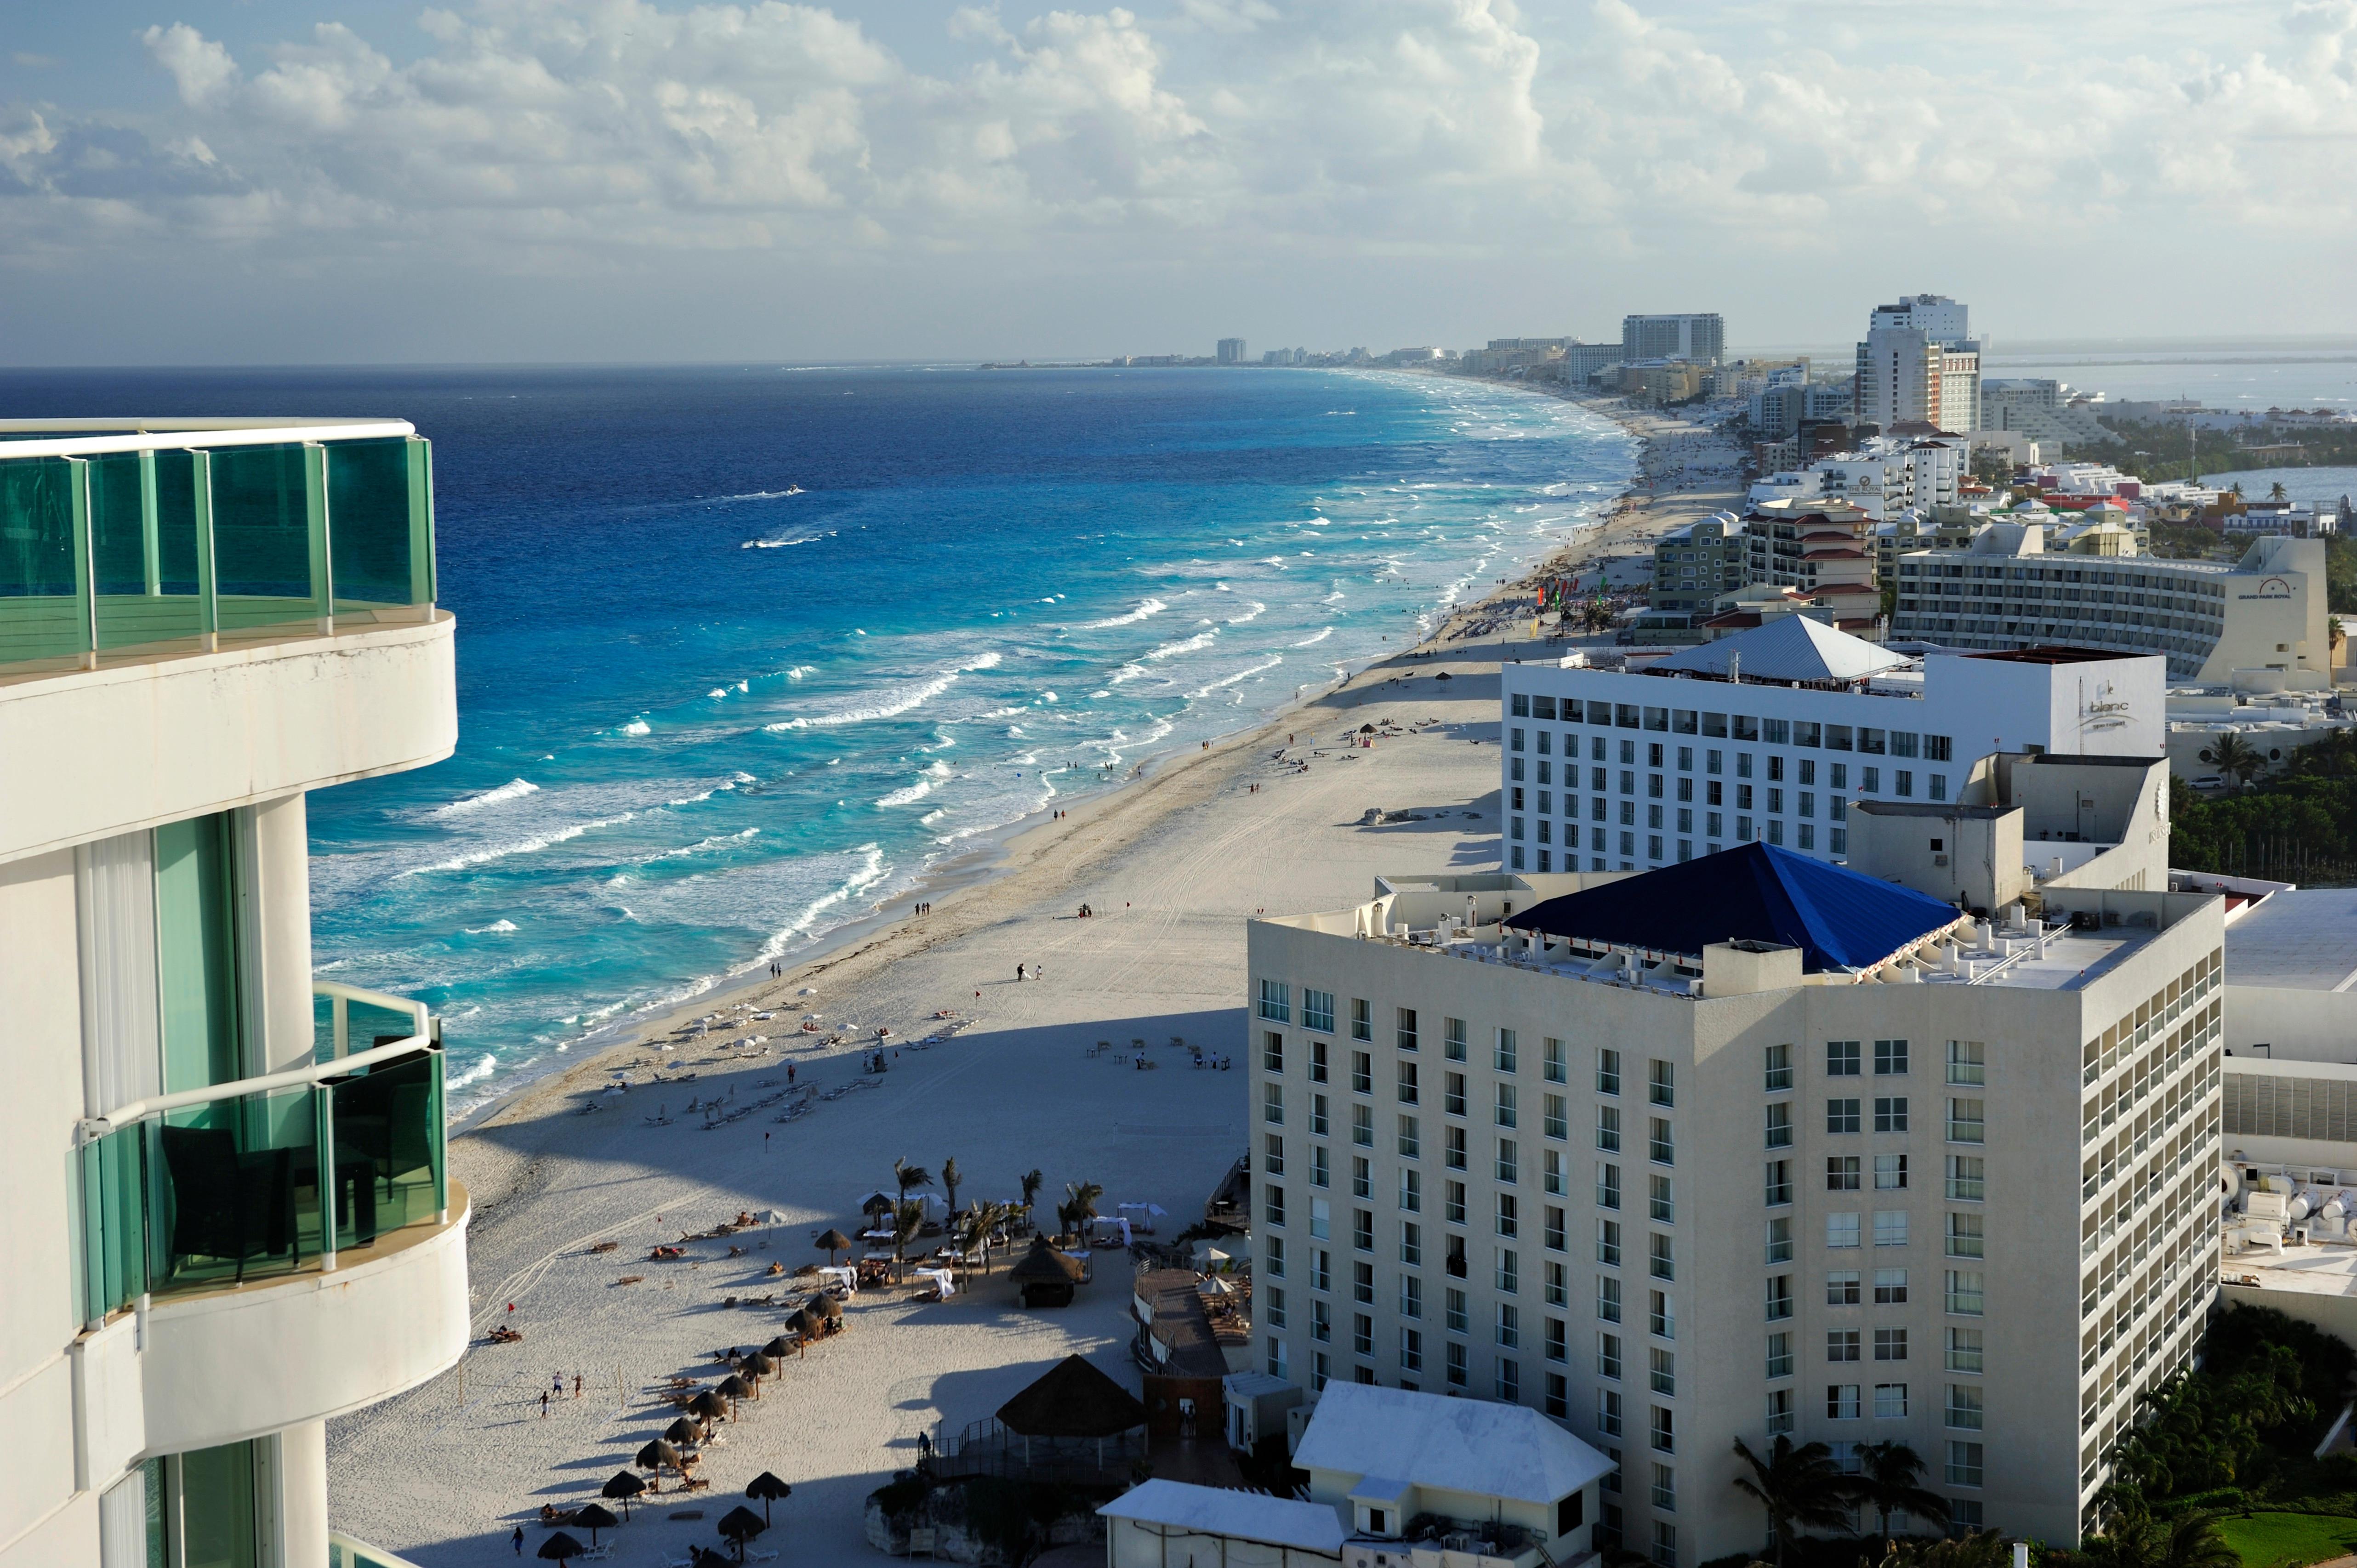 Chac Mol beach, Cancun, Yucatan Peninsula, Quintana Roo, Mexico, Latin America, North America